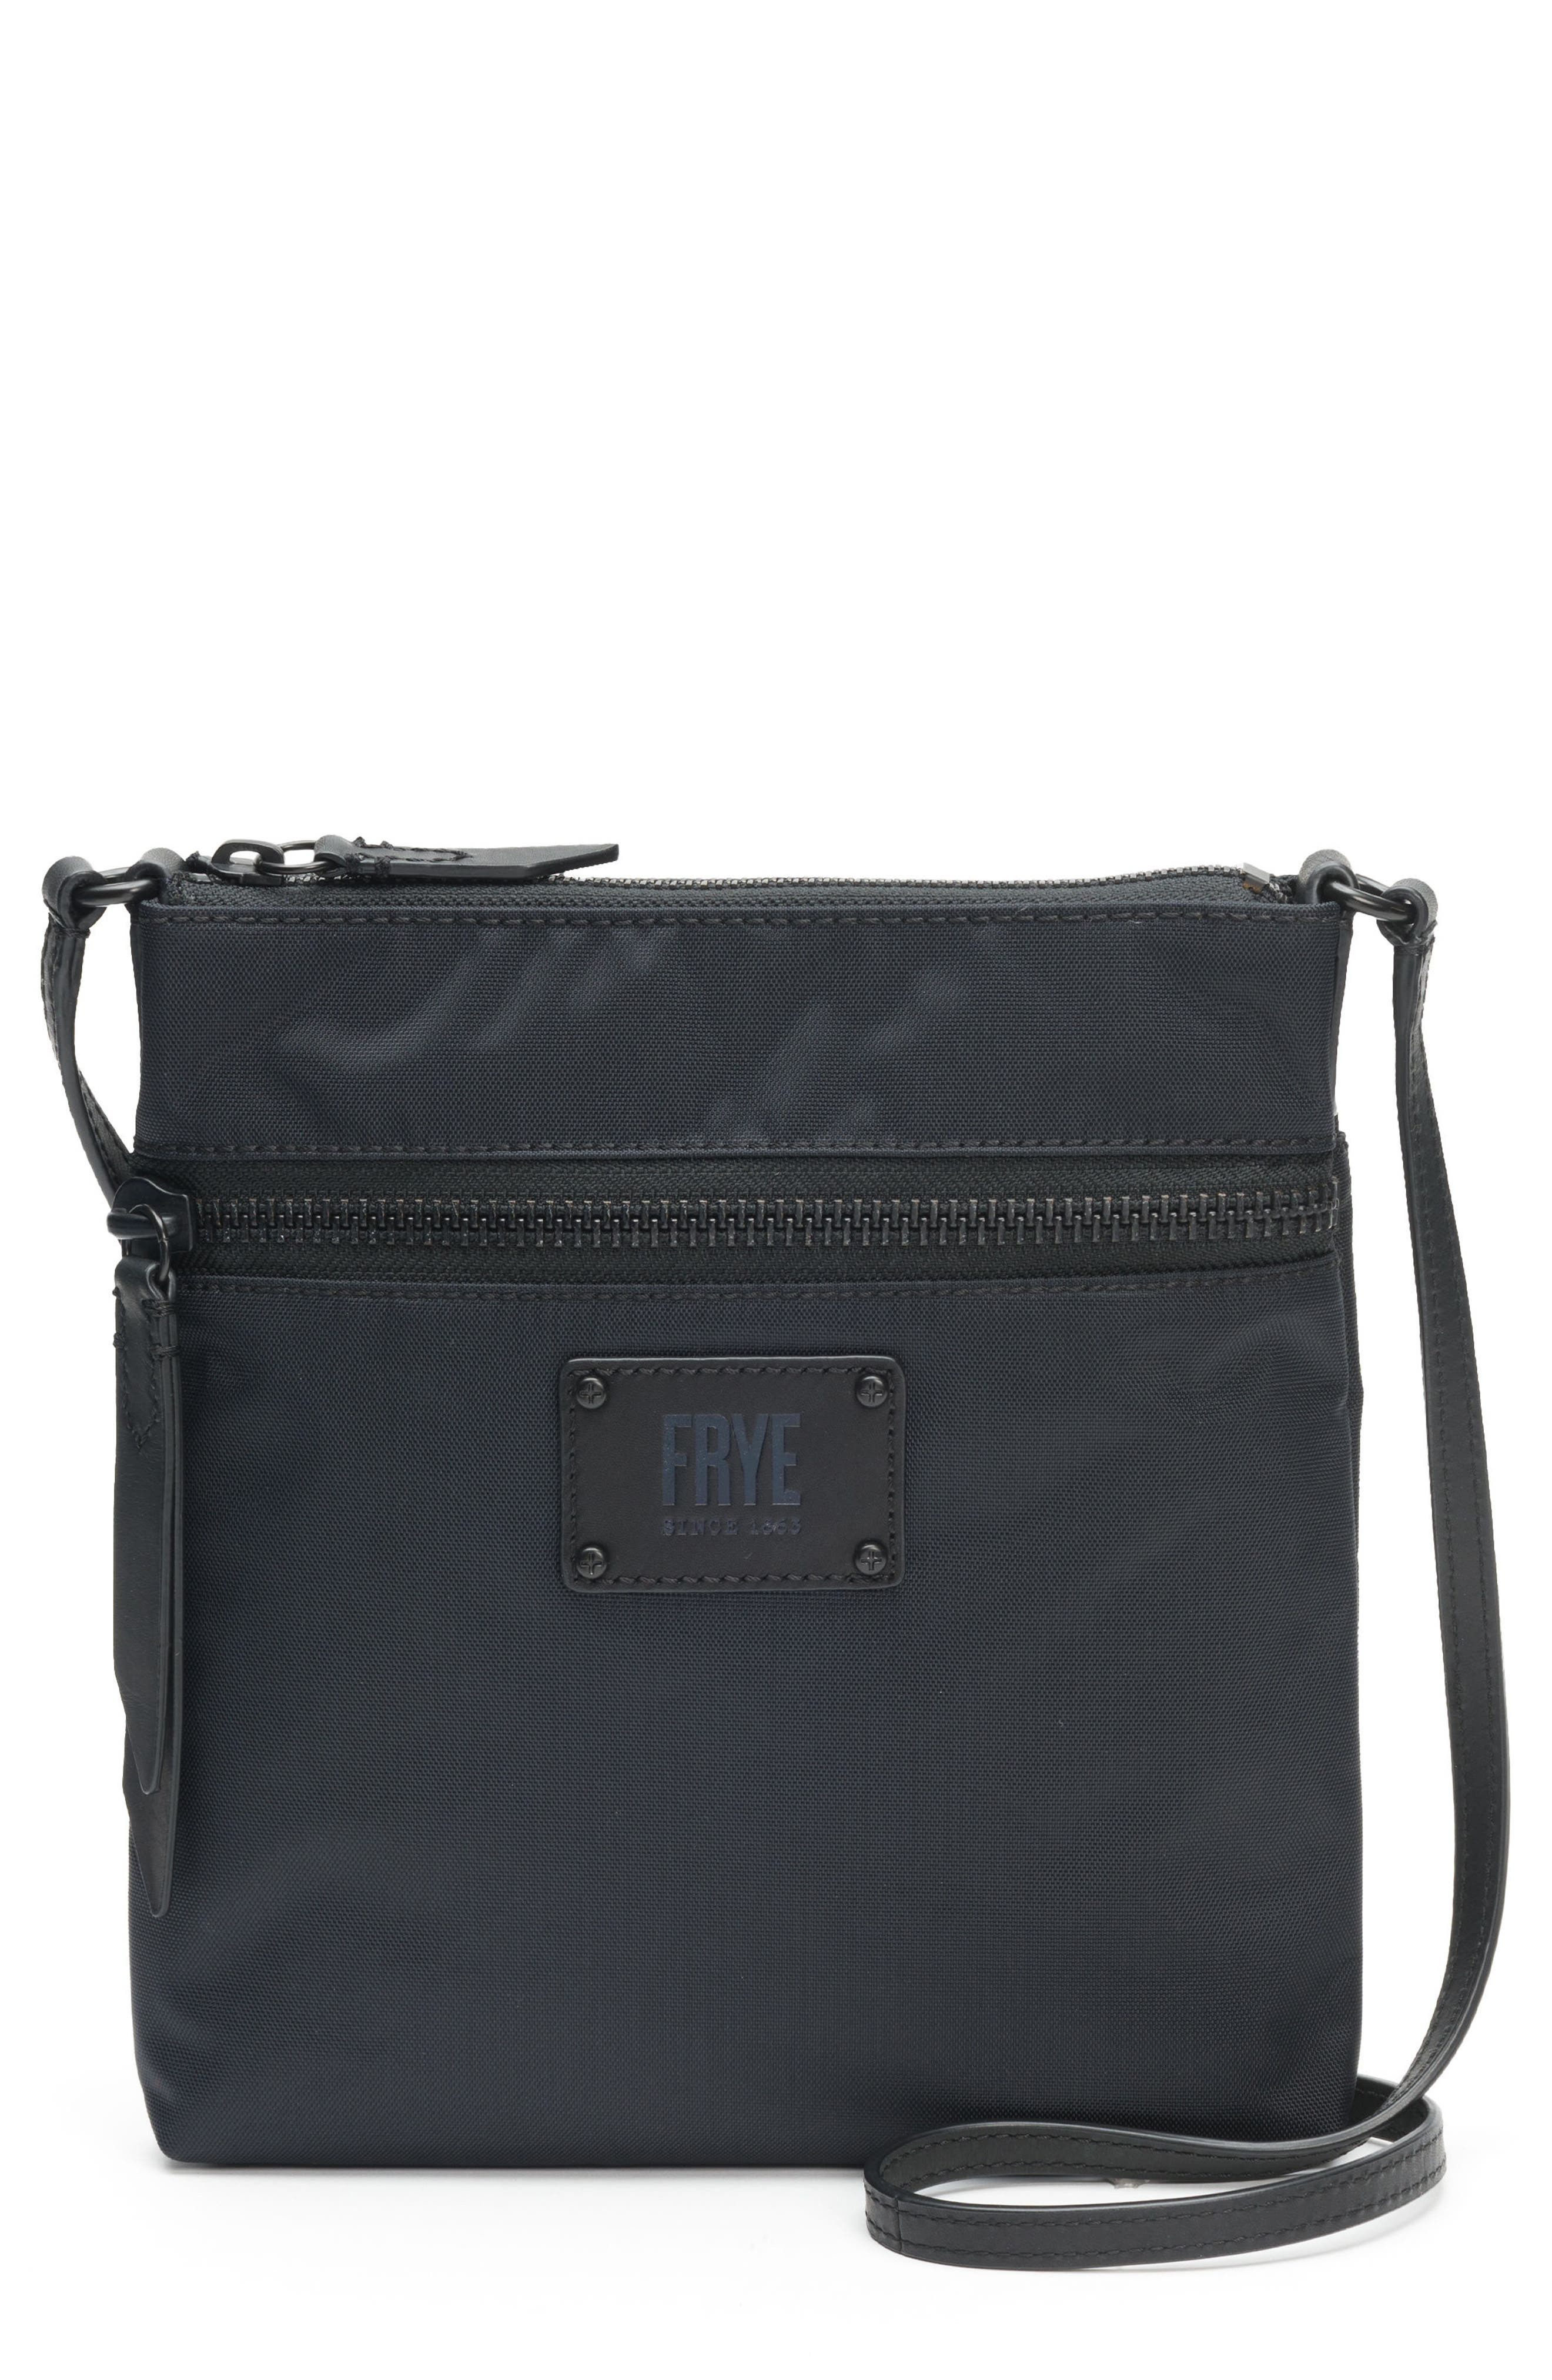 Ivy Nylon Crossbody Bag,                             Main thumbnail 1, color,                             MATTE BLACK